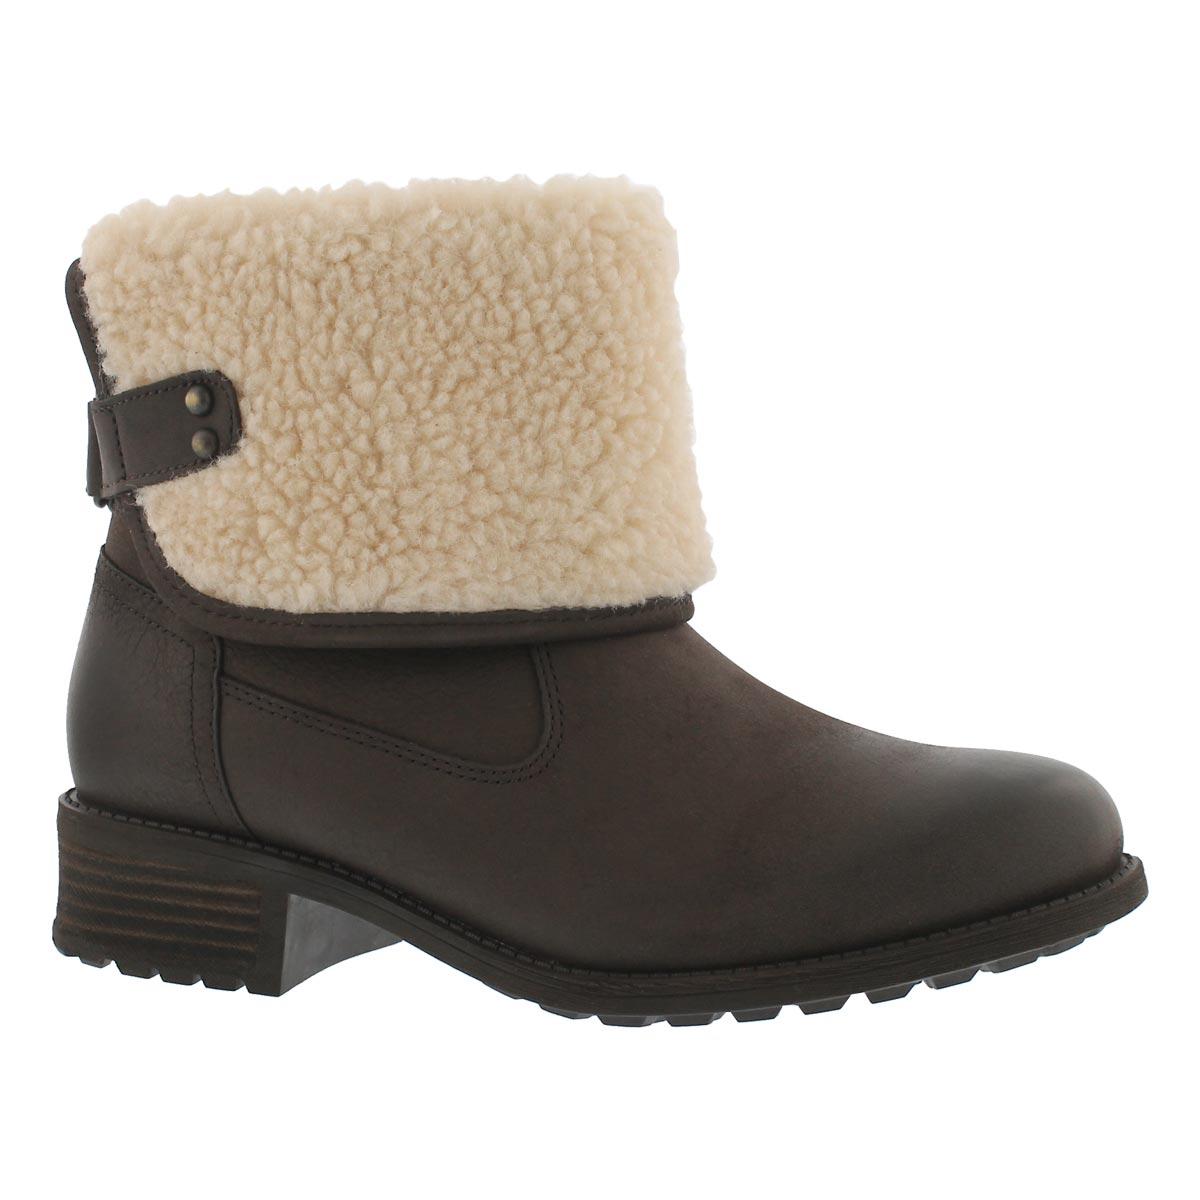 ab0ae4c4318 Women's ALDON stout fold cuff boots